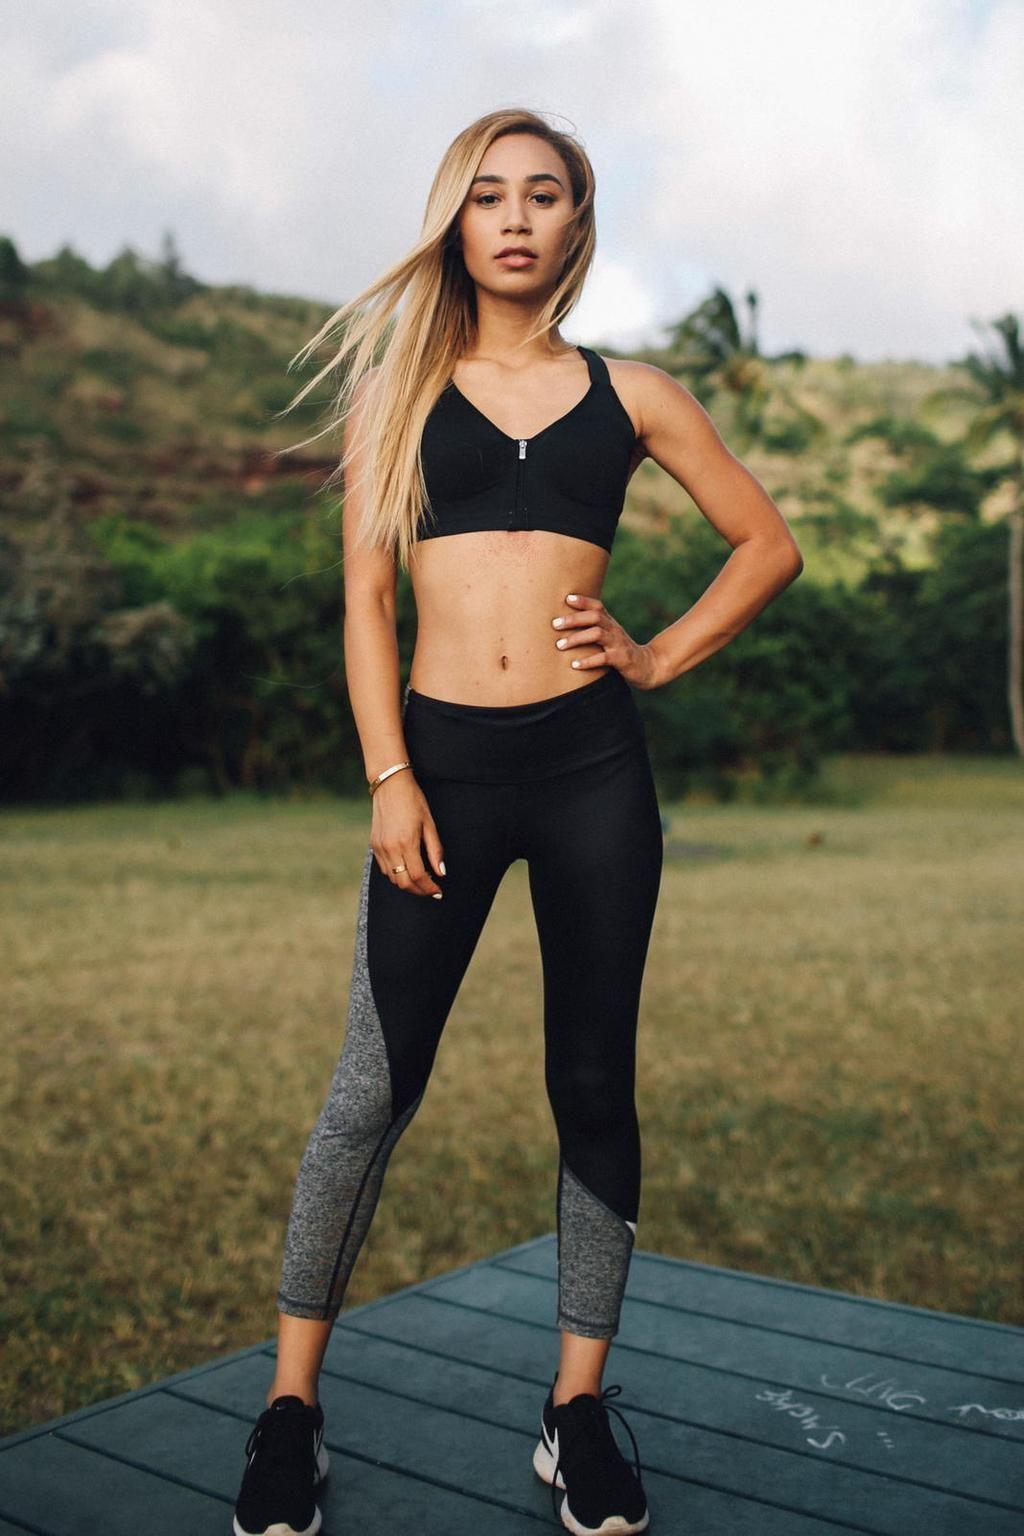 Eva h tight body